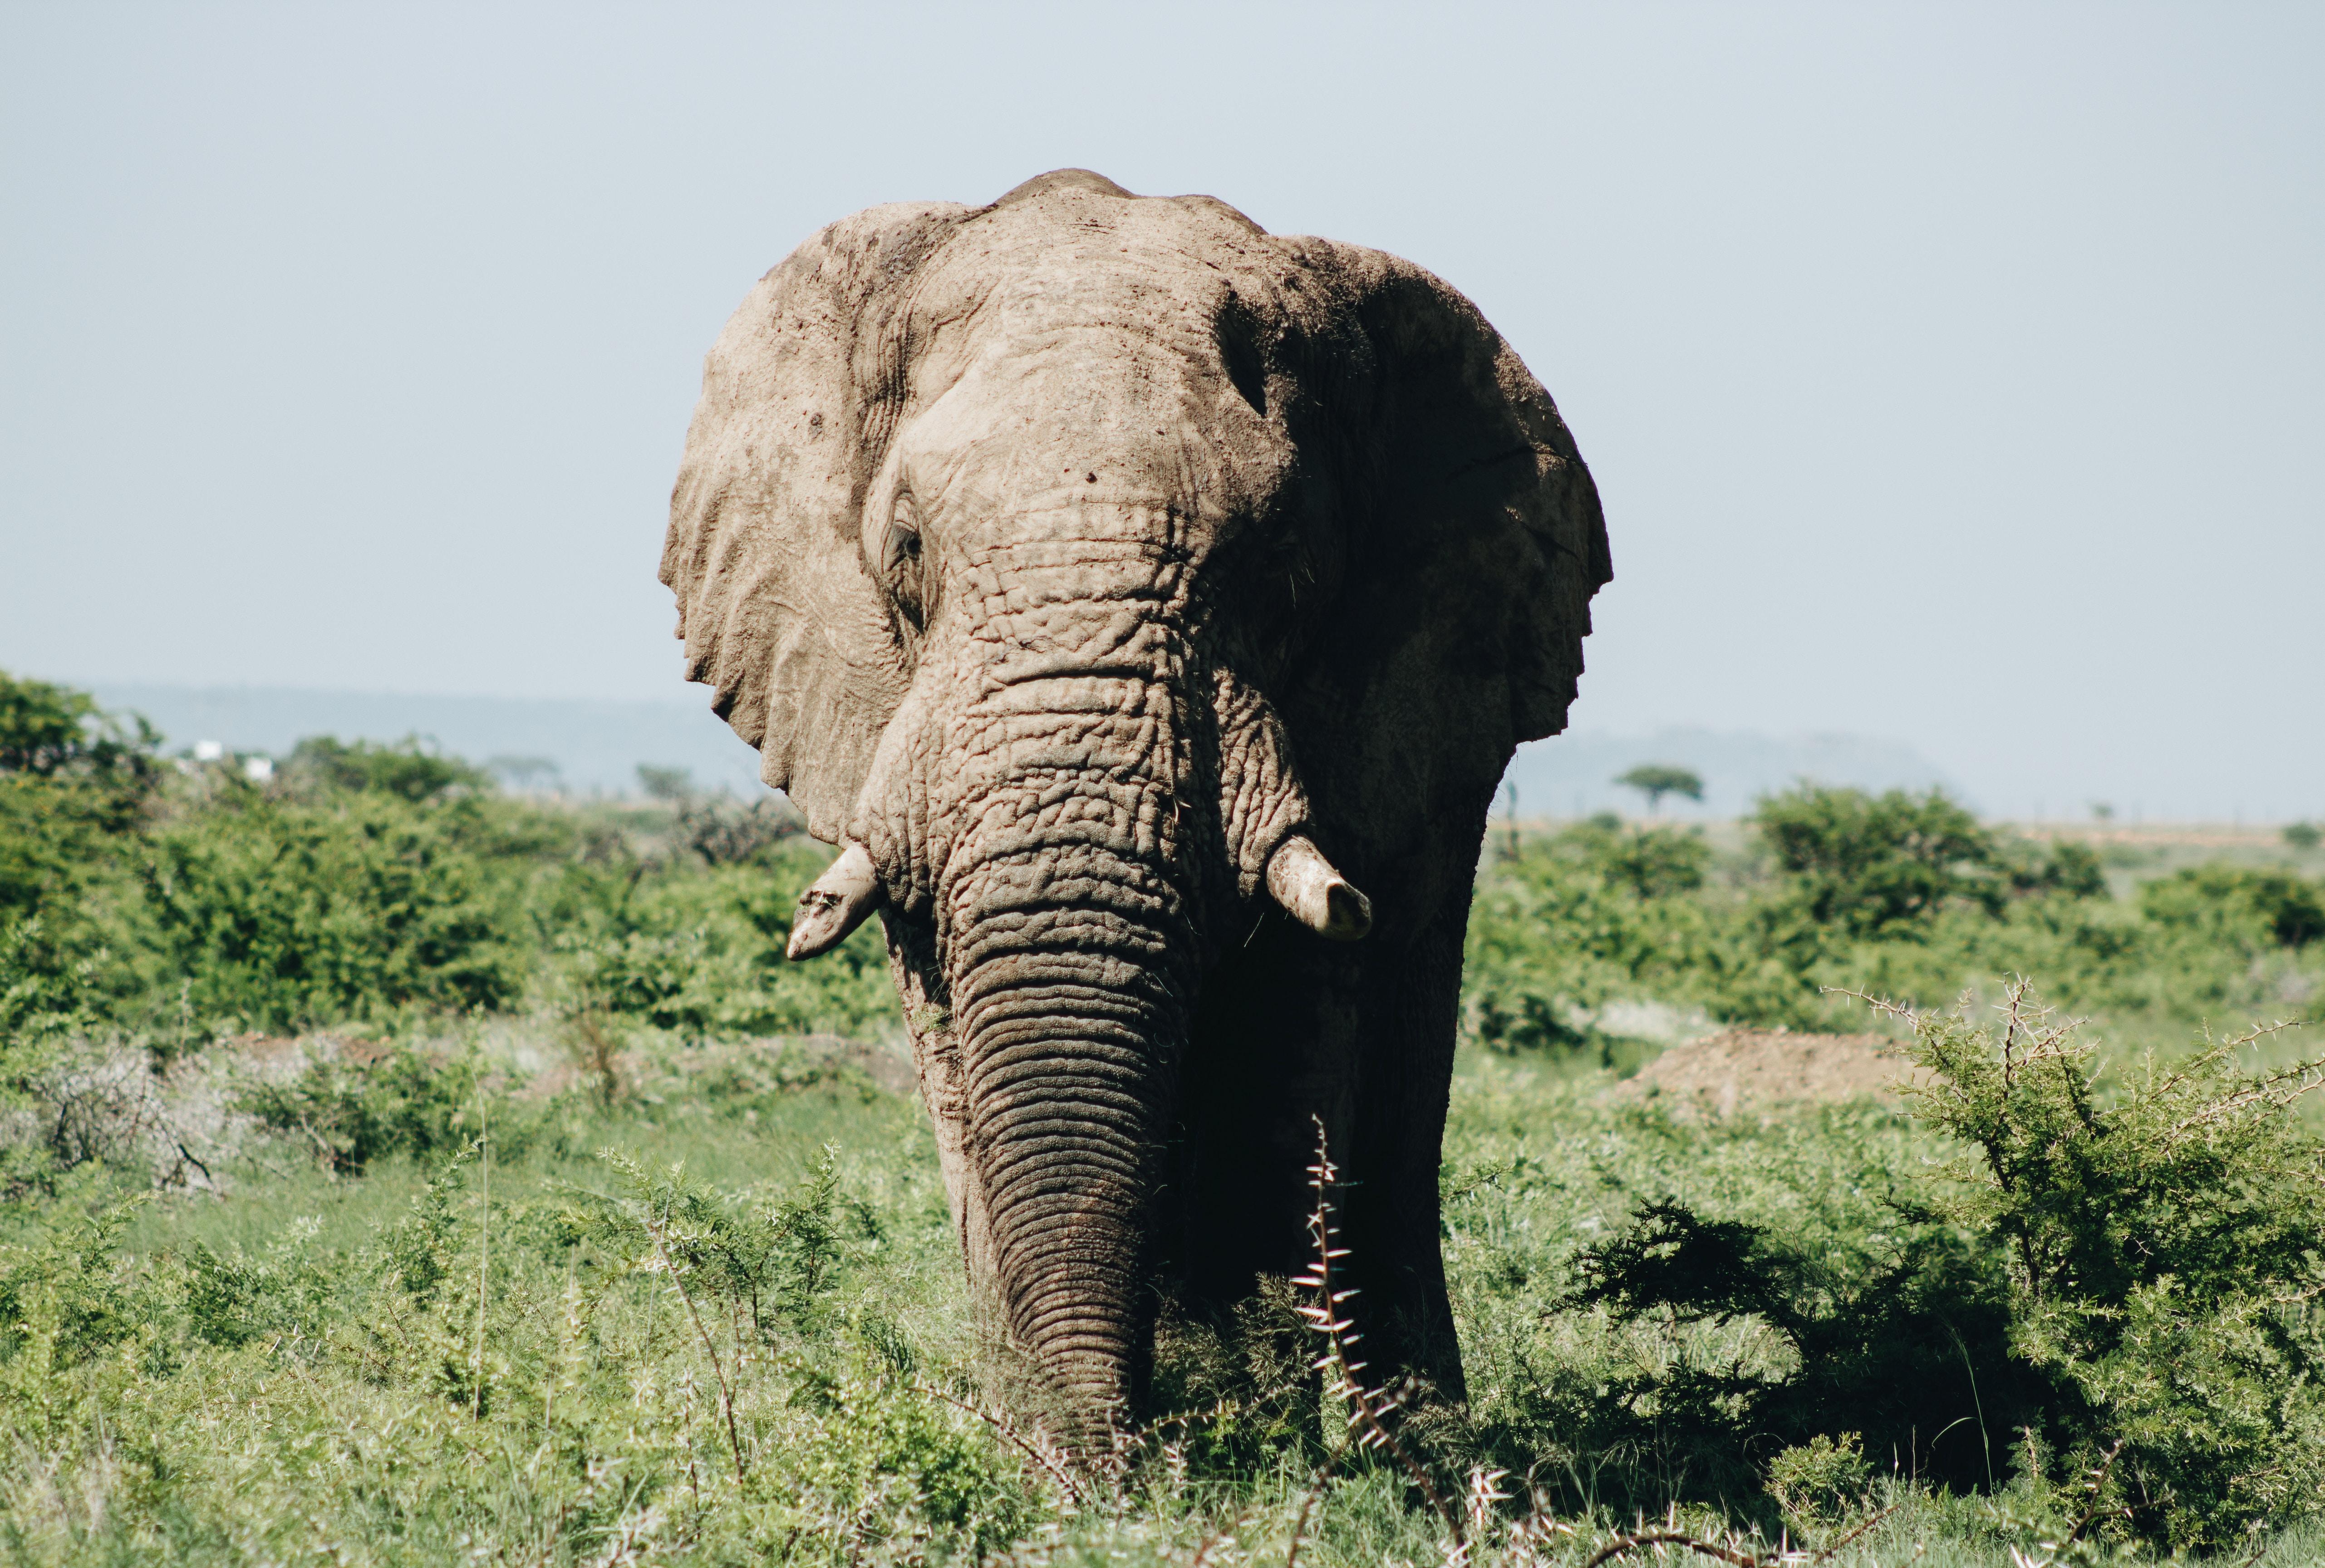 black elephant of green grass